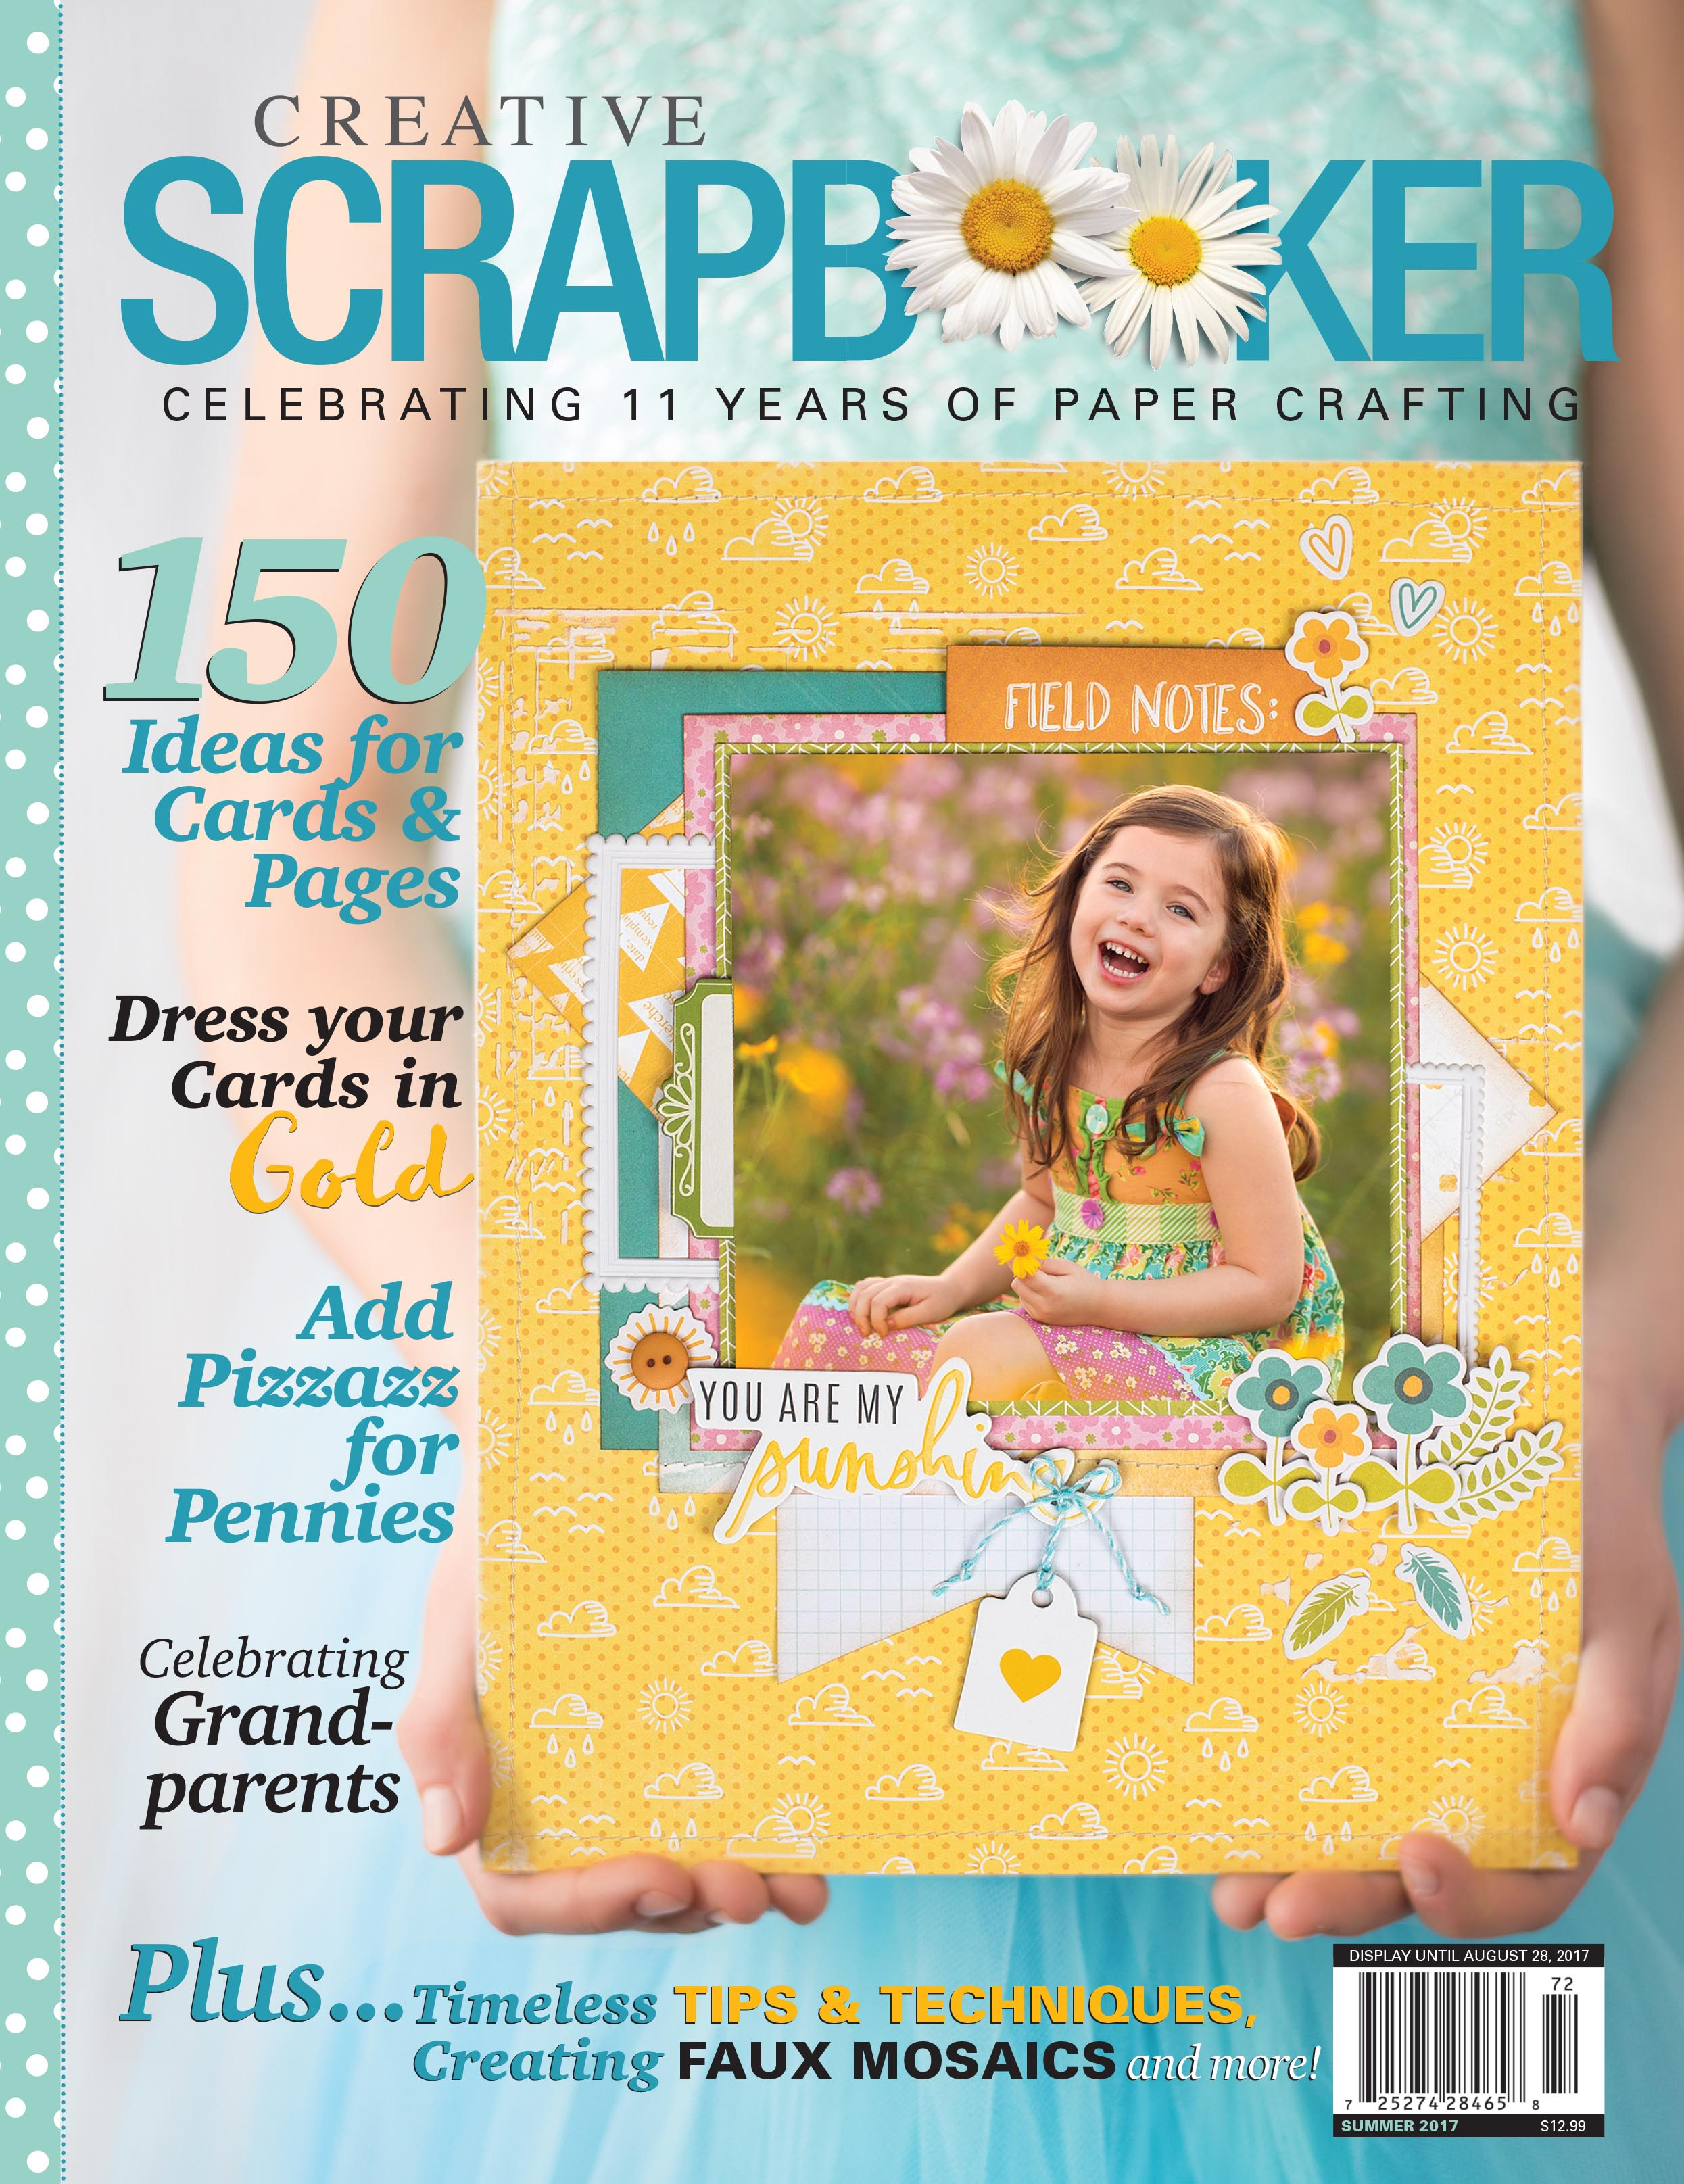 Summer 2017 Creative Scrapbooker Magazine Cover